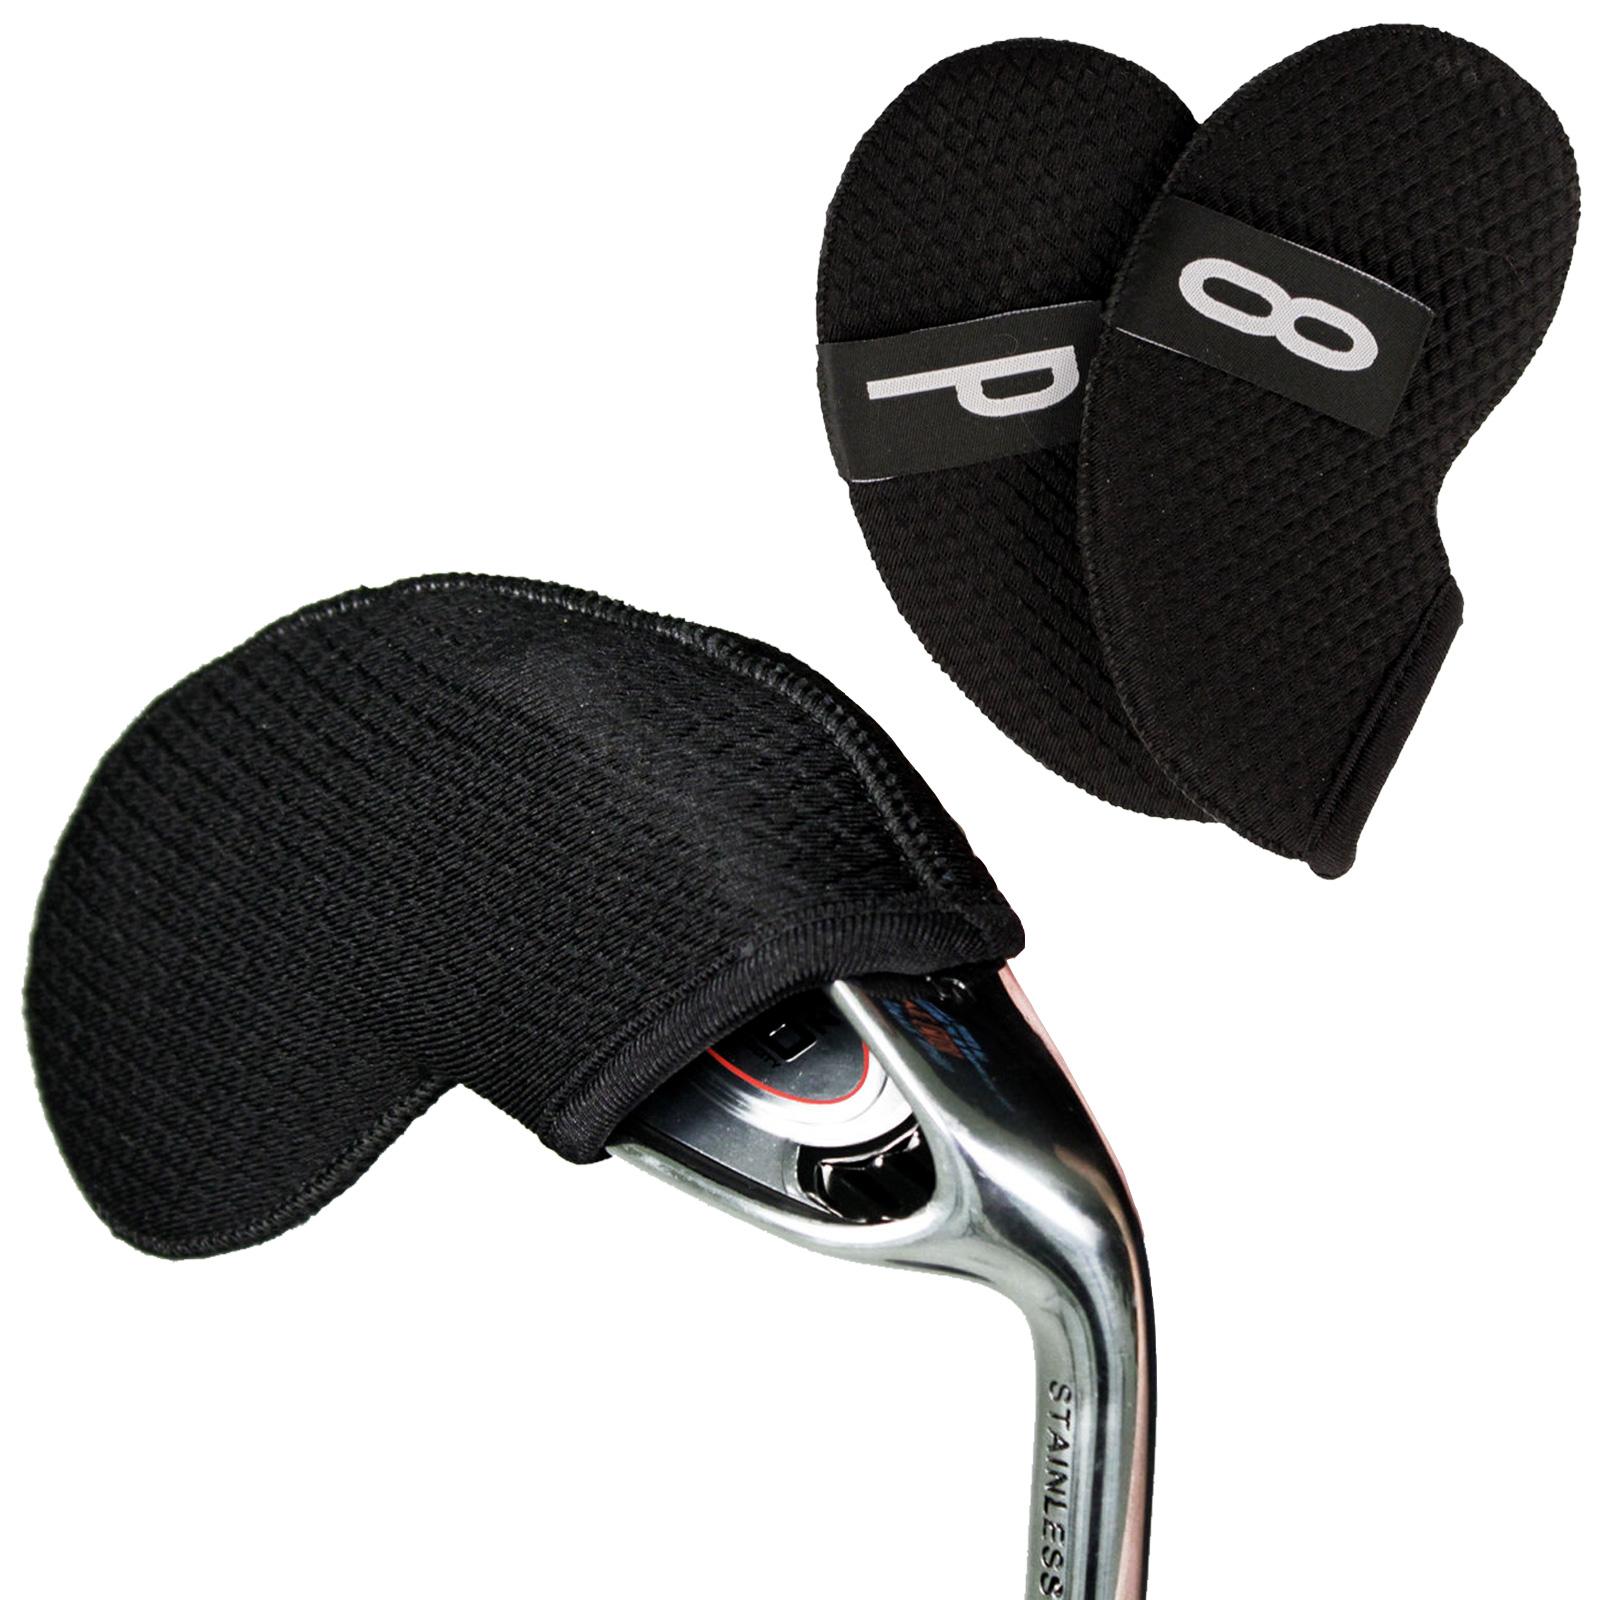 Indexbild 2 - Masters Headkase Black Golf Club Headcovers - Mallet Blade Irons Set Model